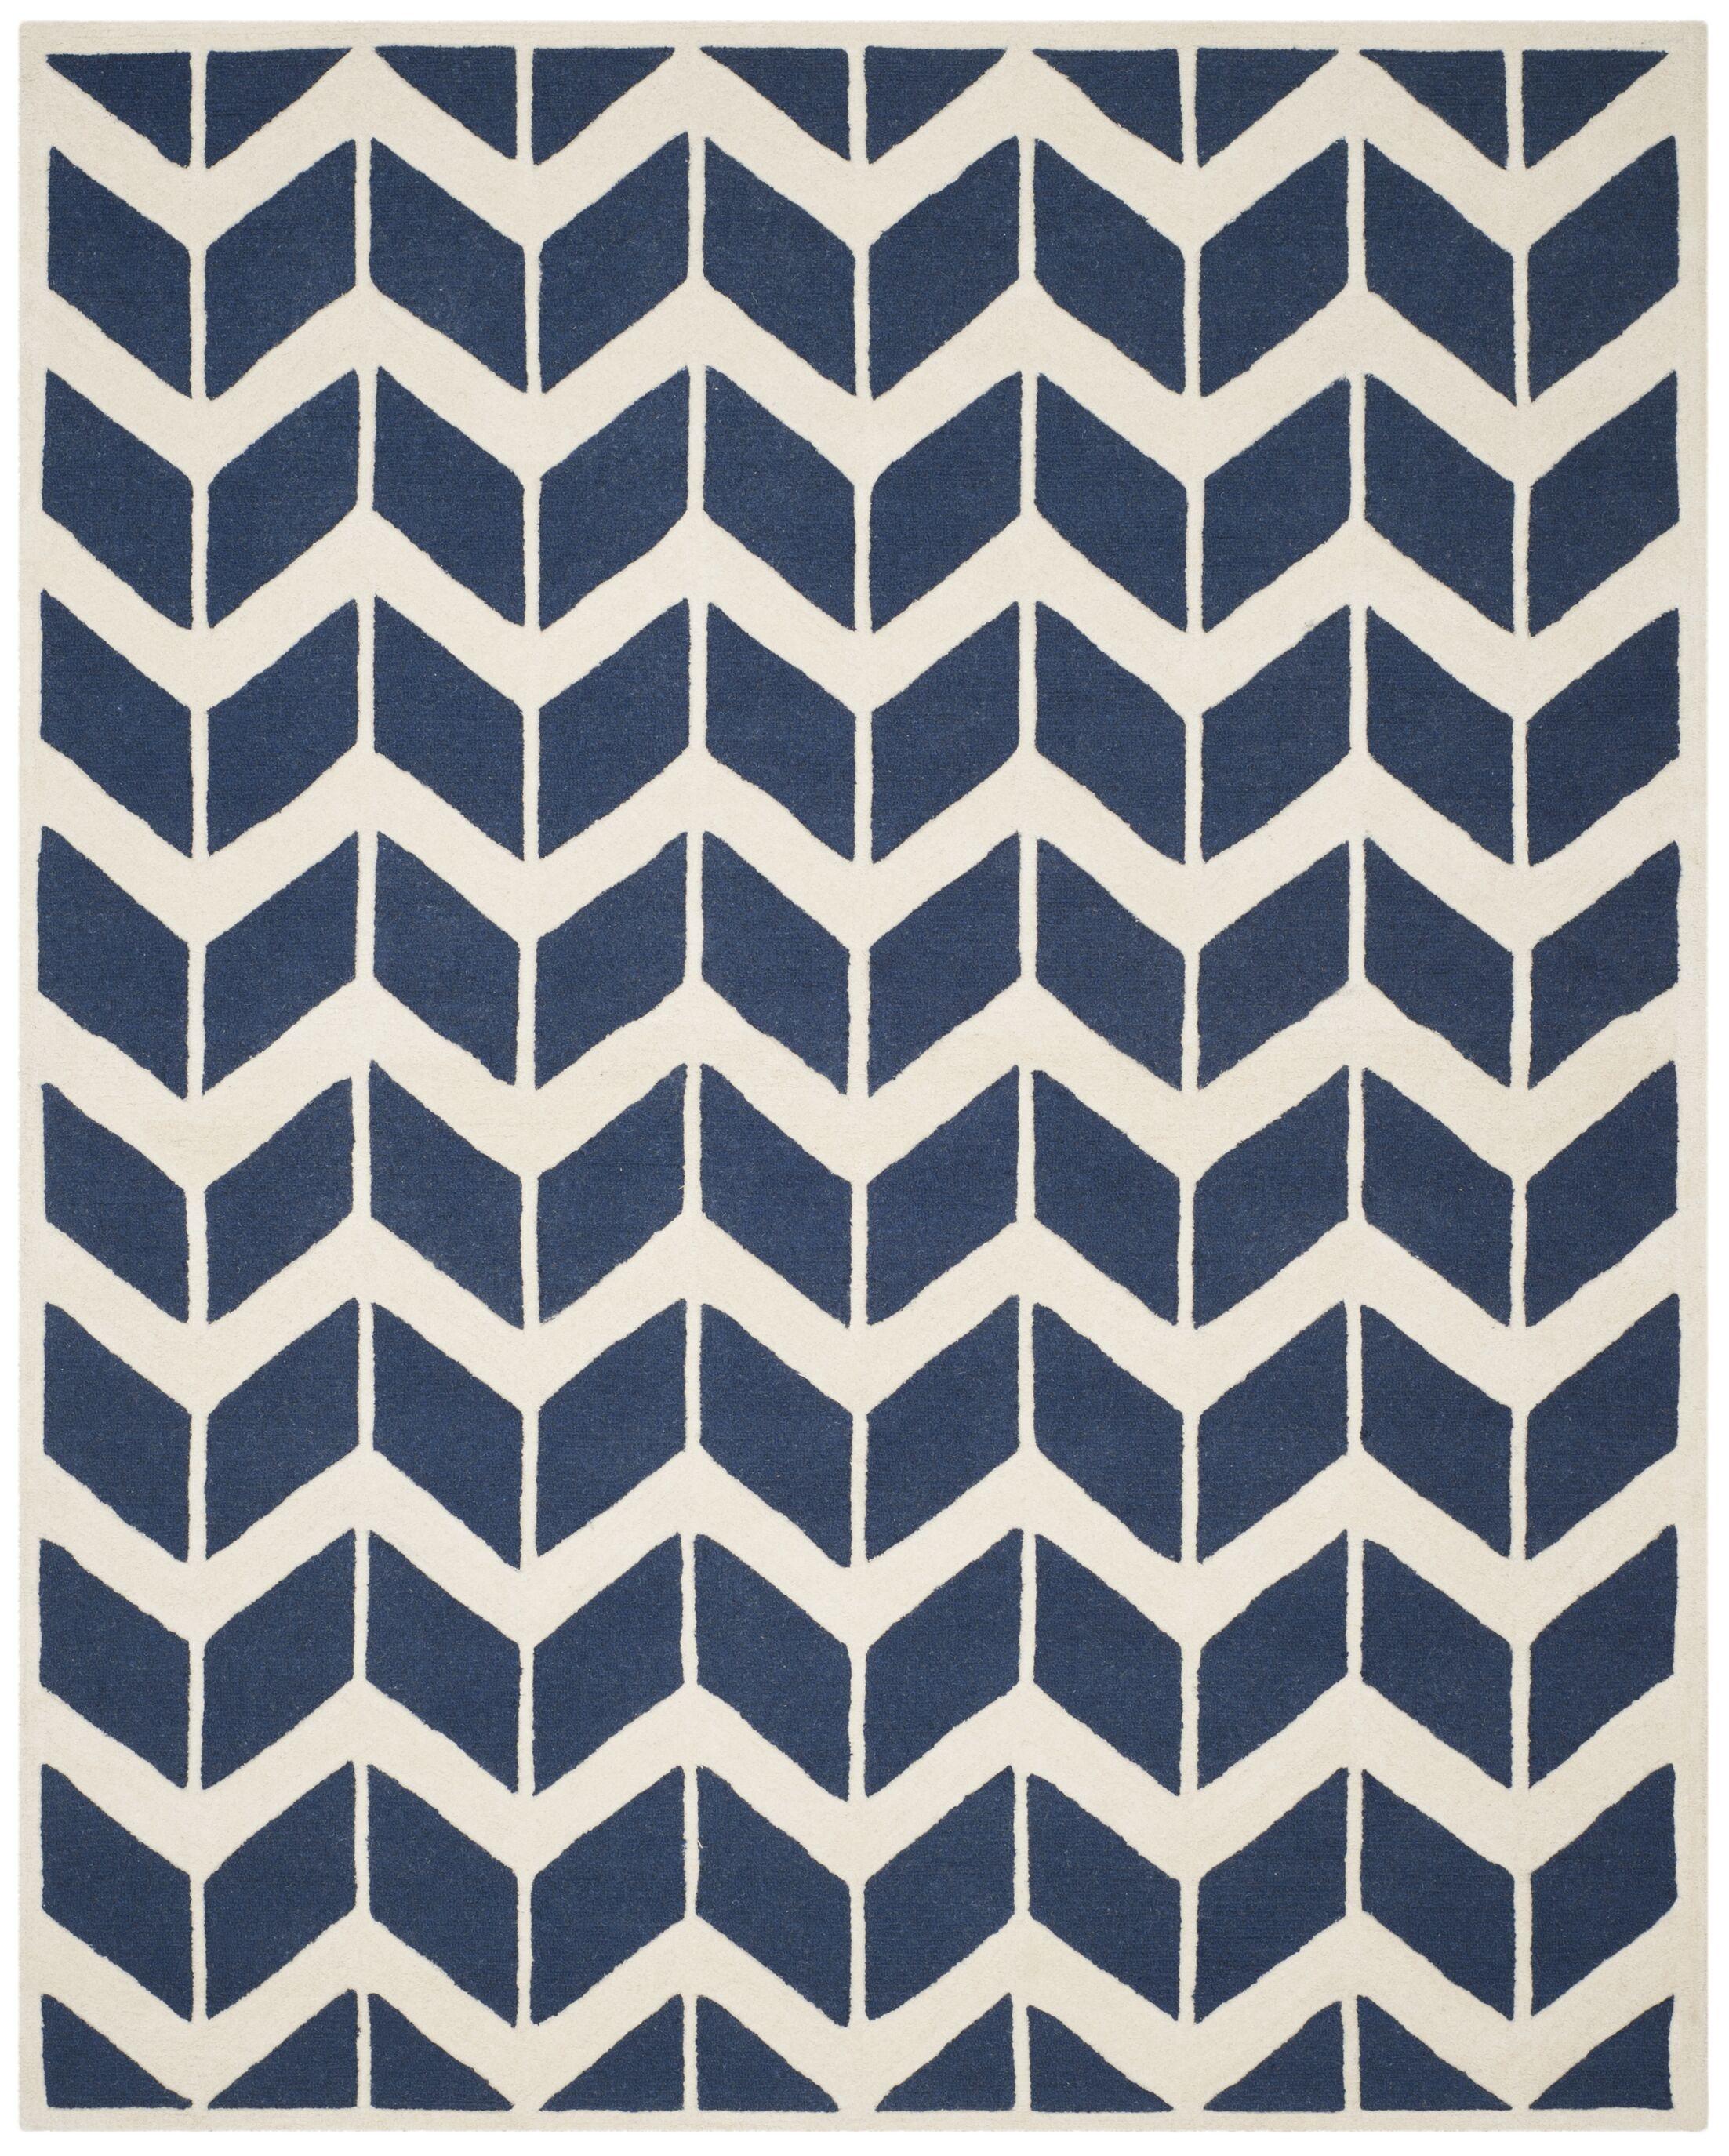 Esperance Navy / Ivory Area Rug Rug Size: Rectangle 8' x 10'